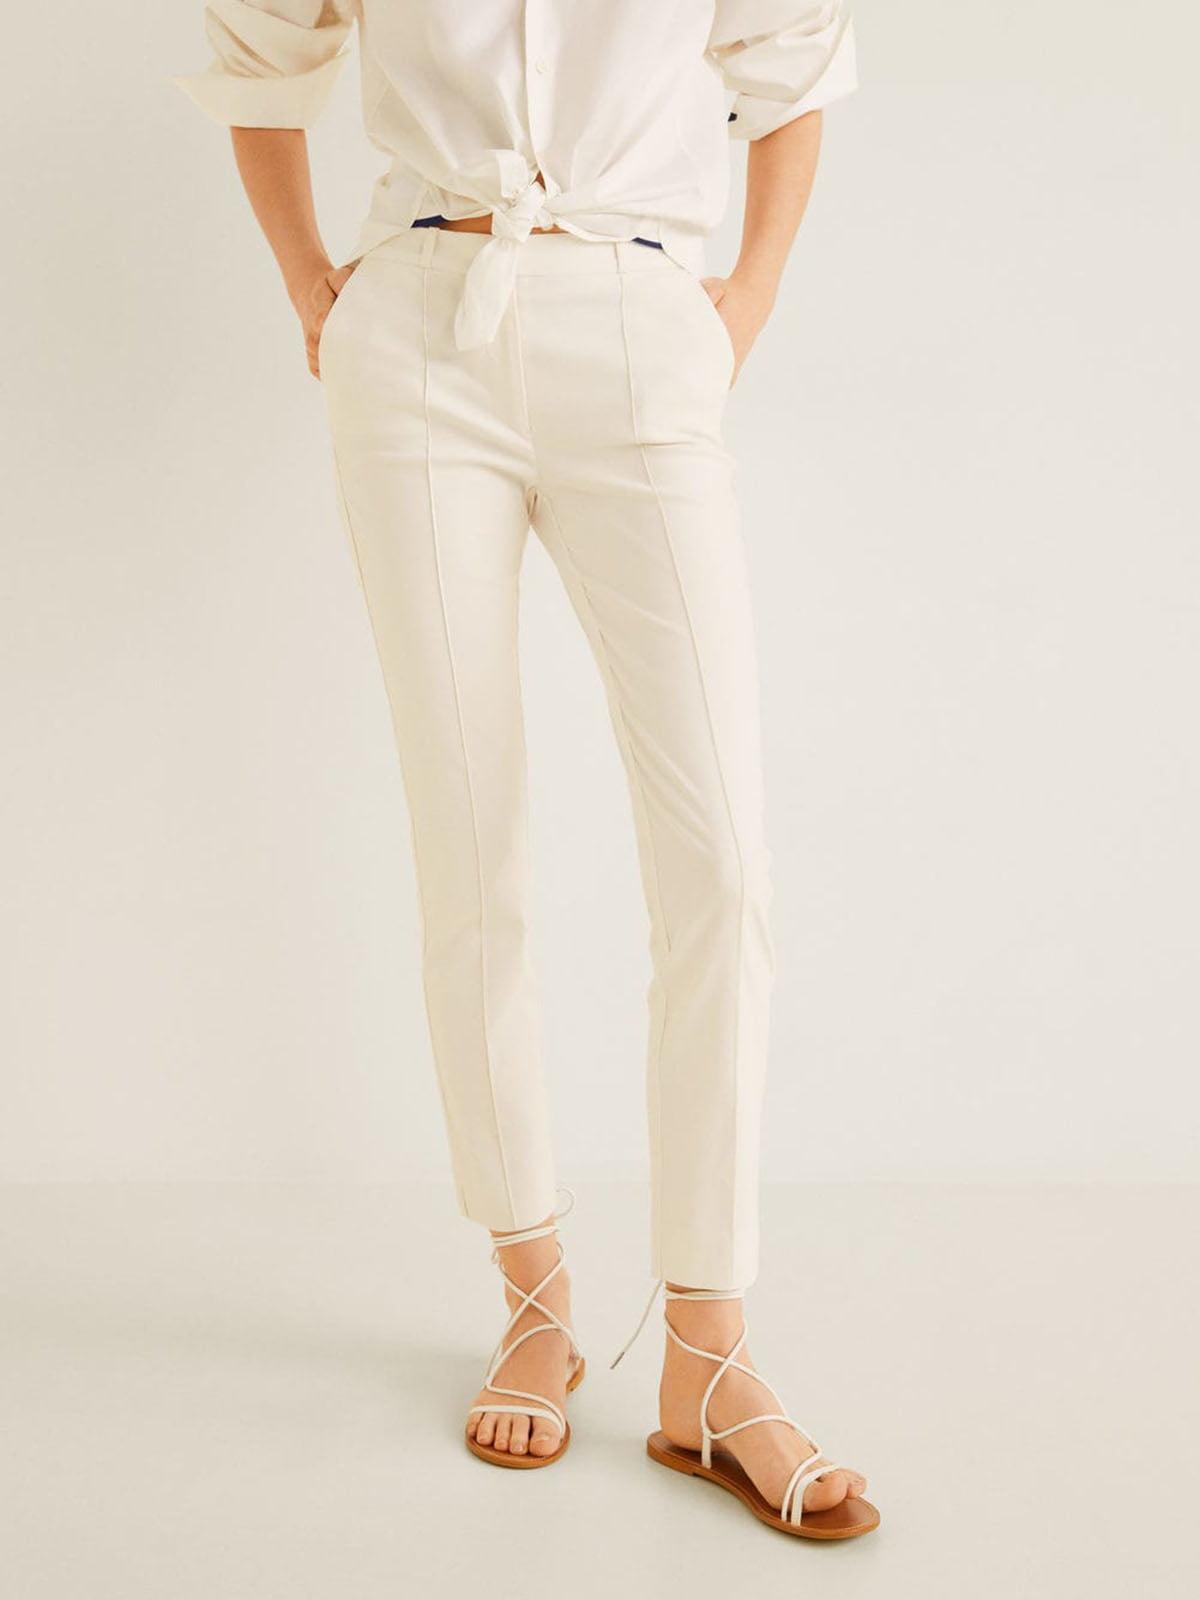 дома женские белые брюки картинки мария